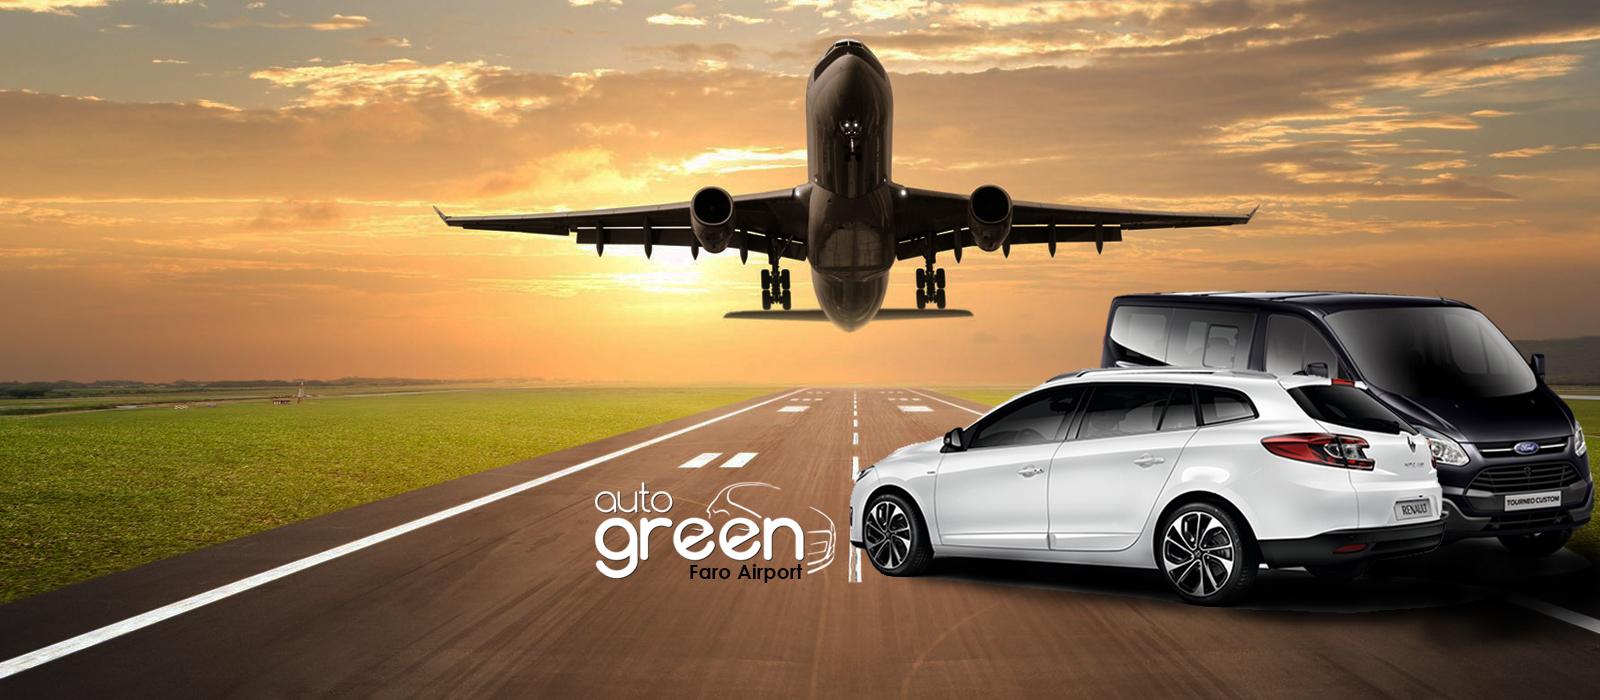 Auto Green Algarve Car Hire